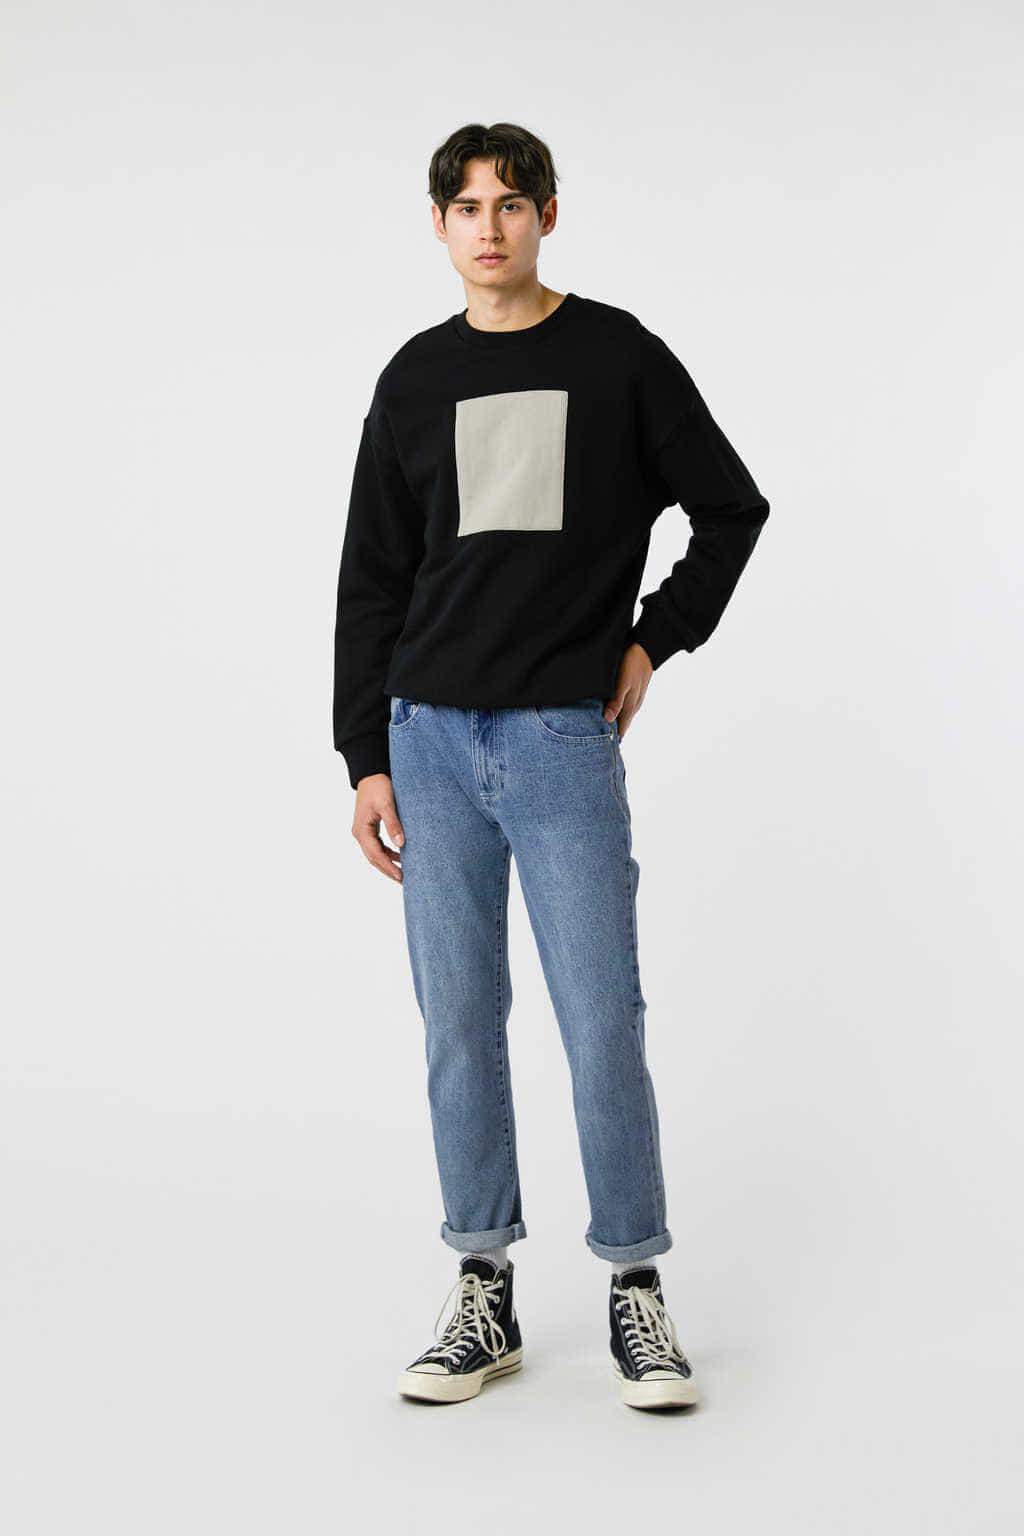 Sweatshirt 3138 Black 14